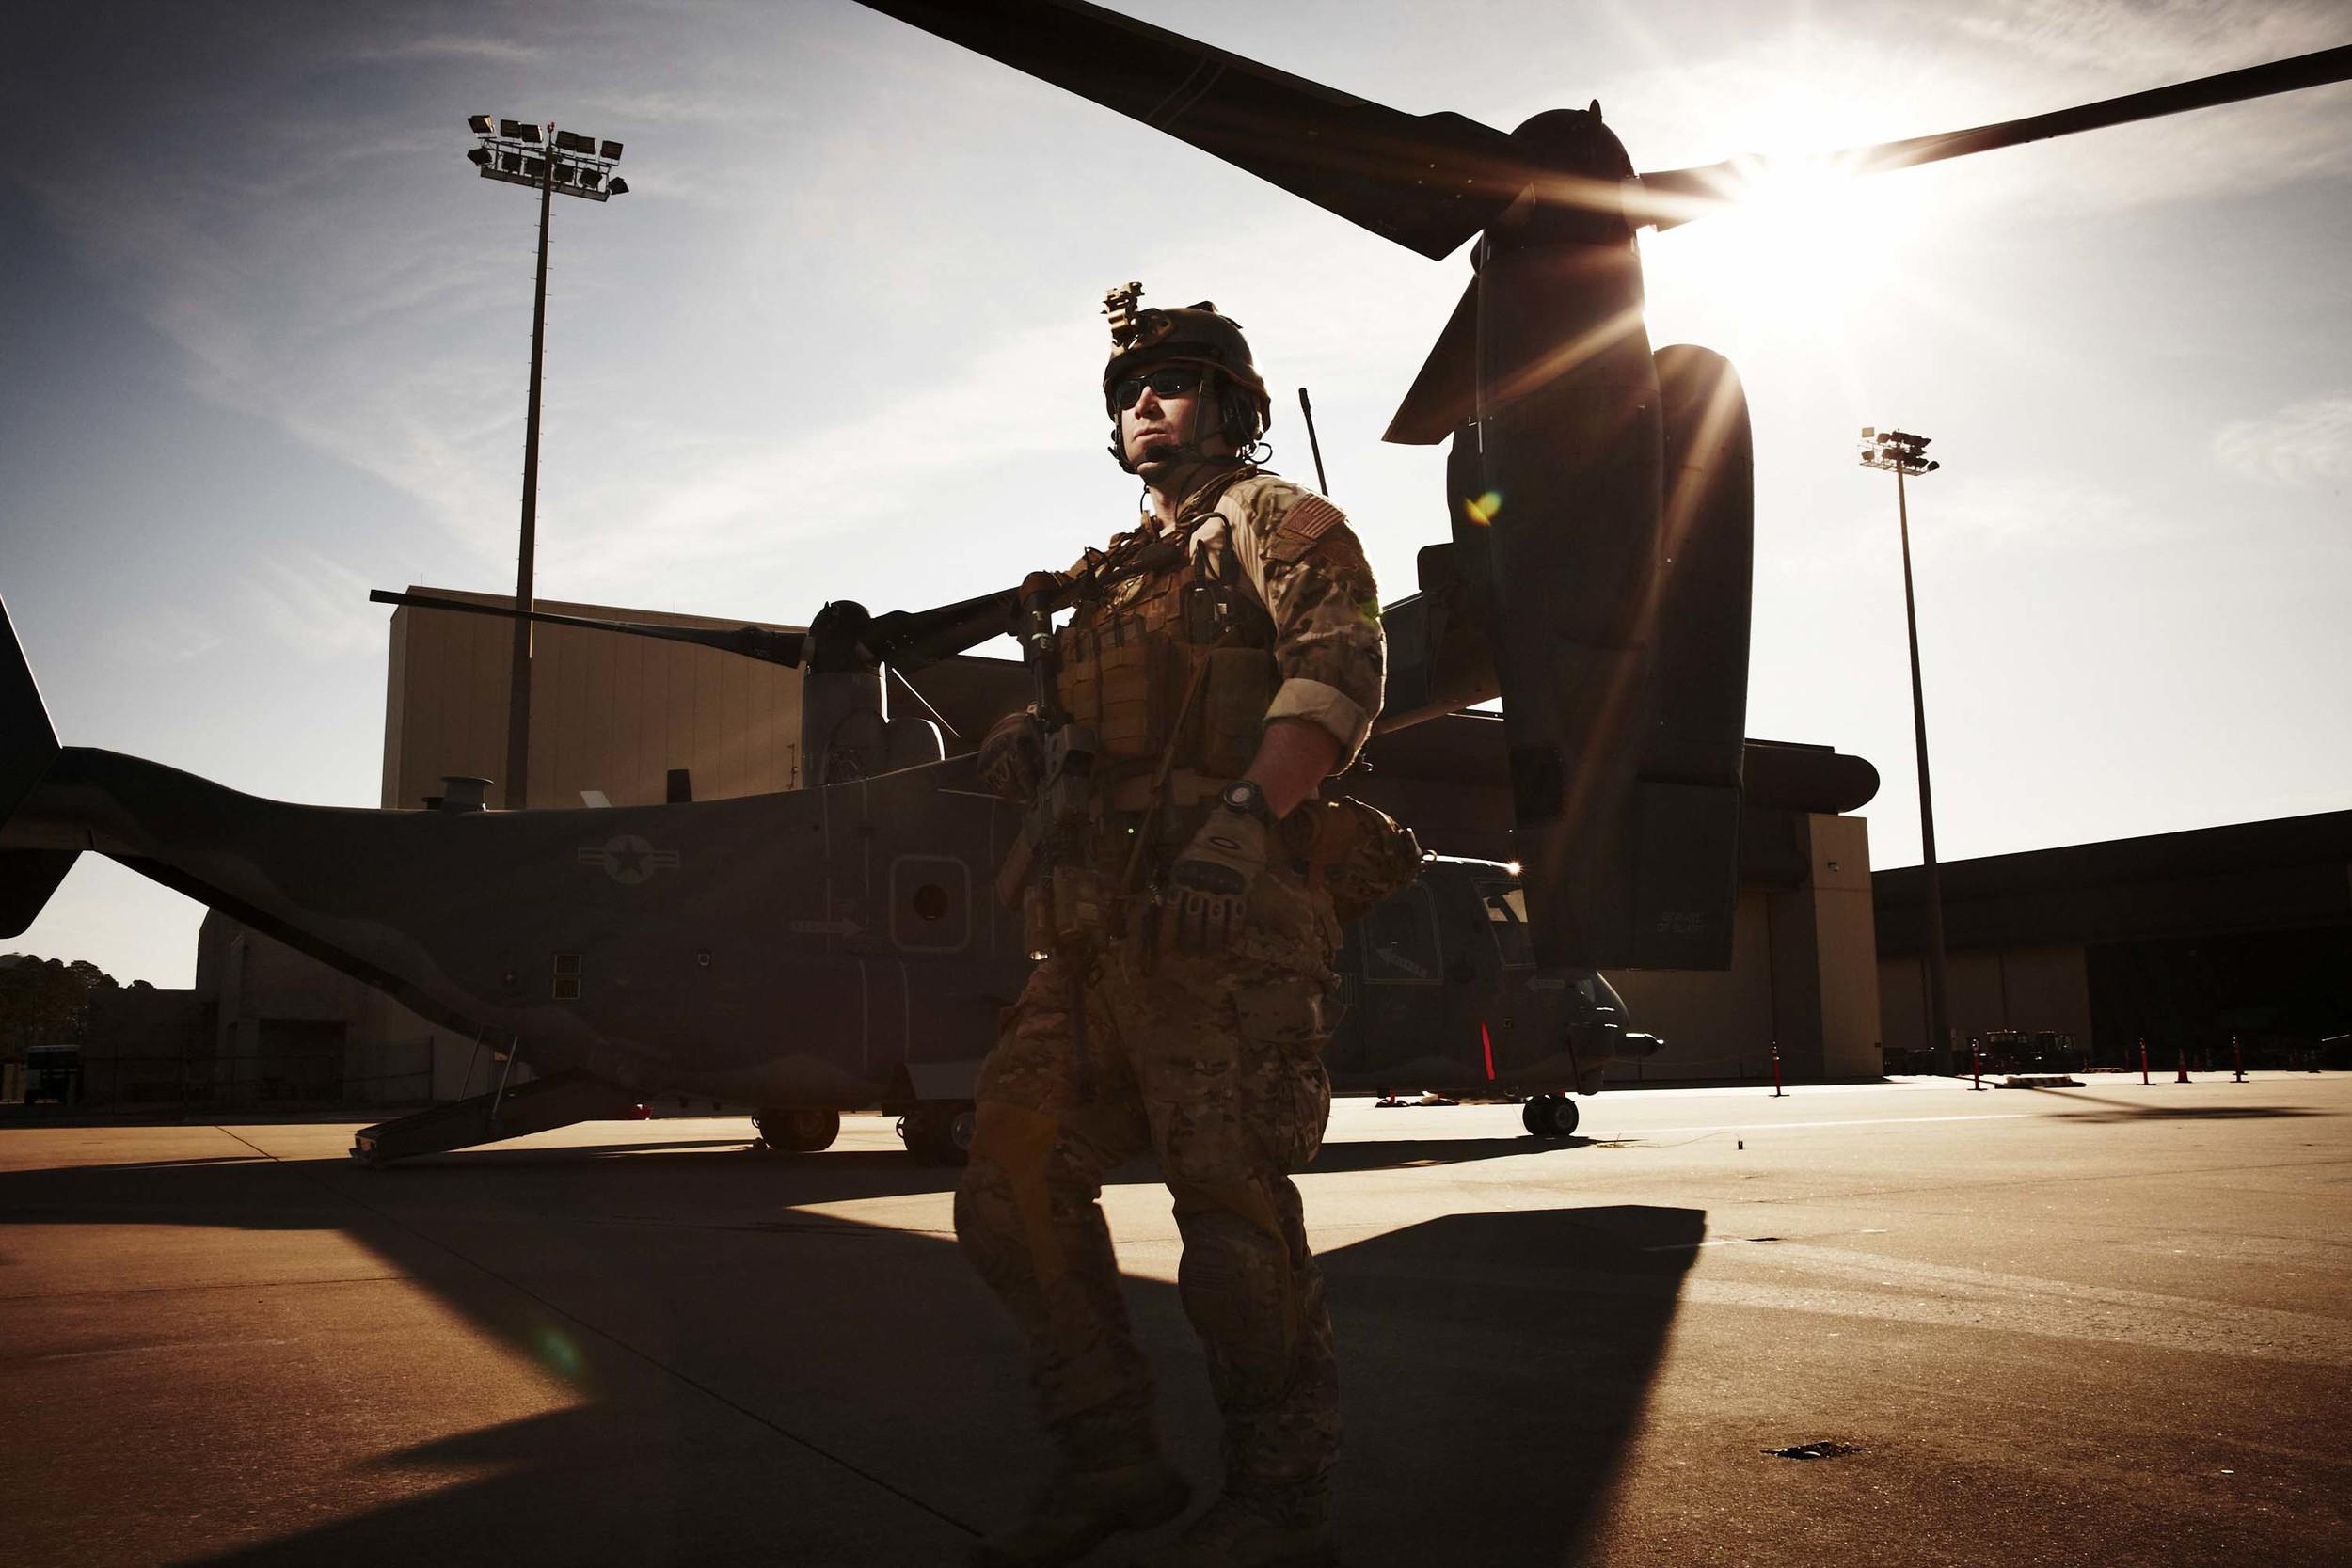 Air Force Special Ops - Hurlburt Field, Pensacola, FL